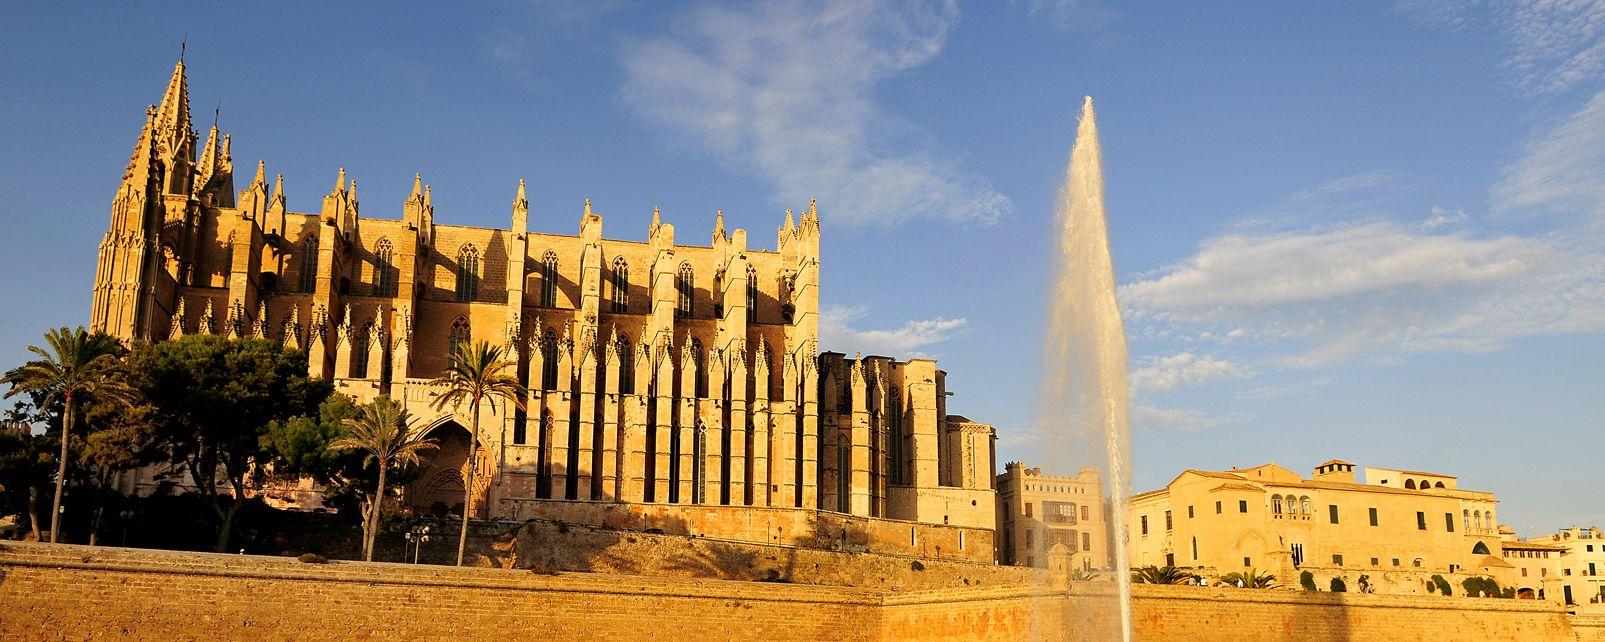 La cathédrale de Palma , Espagne